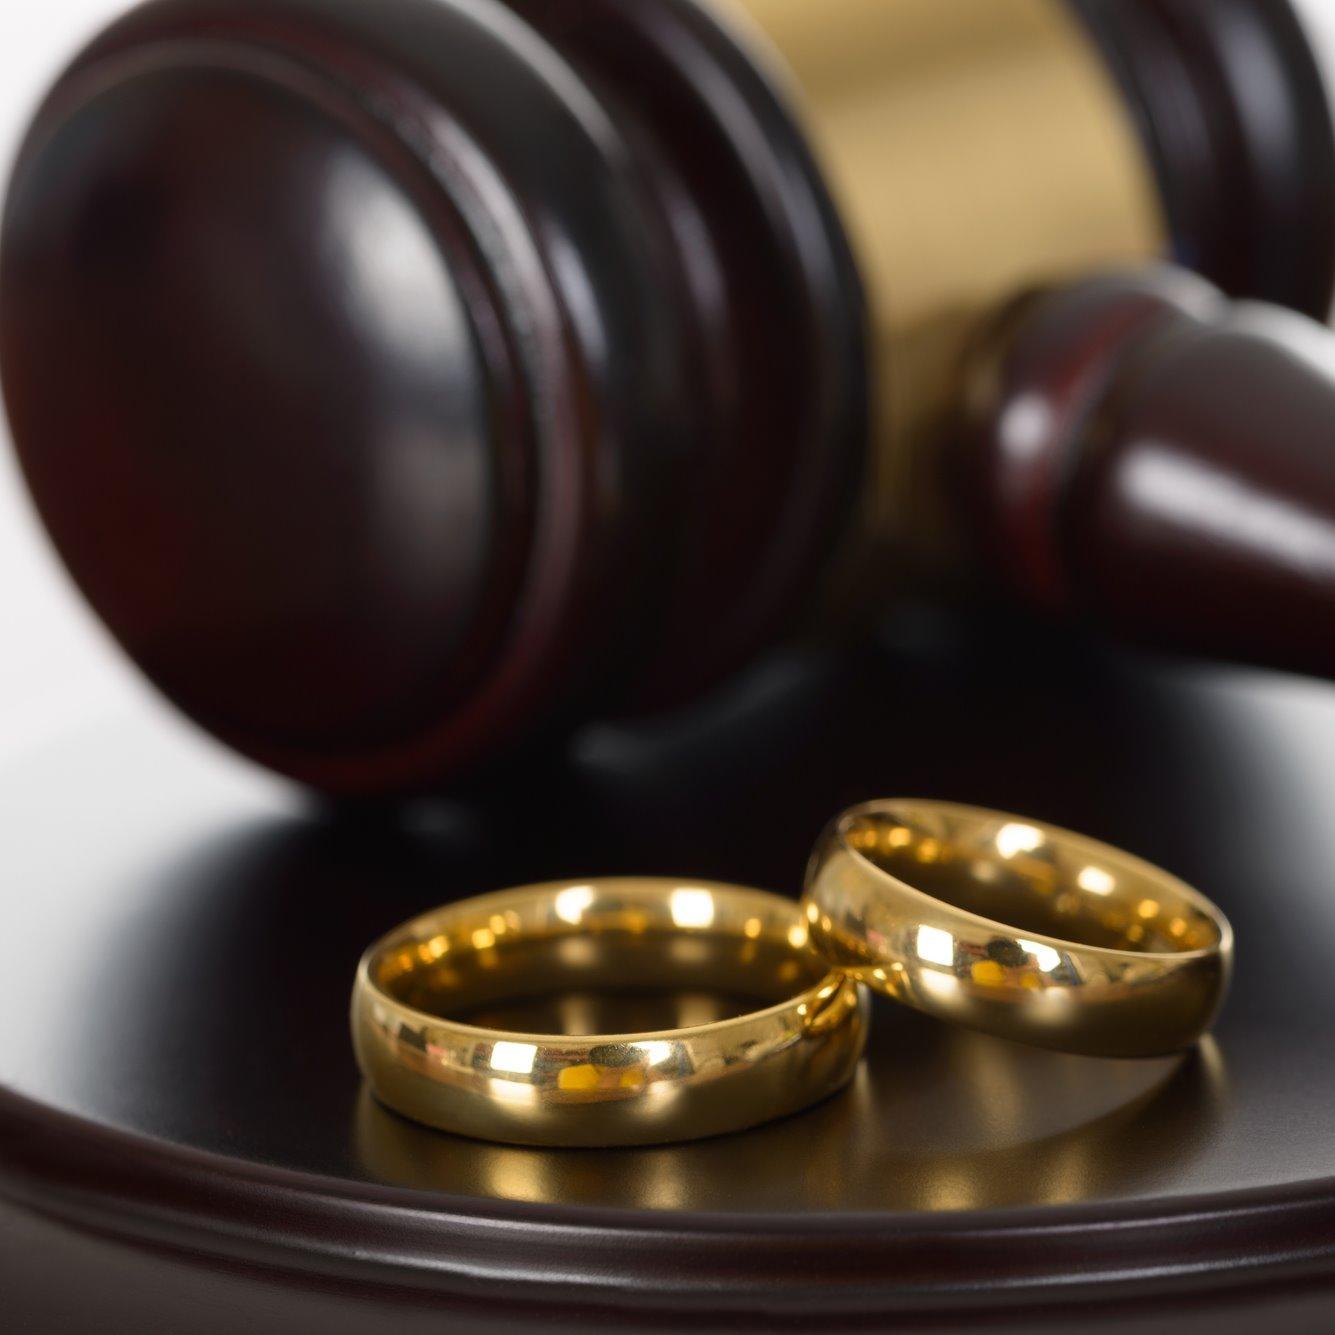 Geoffrey S. Platnick - Divorce and Family Law Attorney of Shulman, Rogers, Gandal, Pordy & Ecker